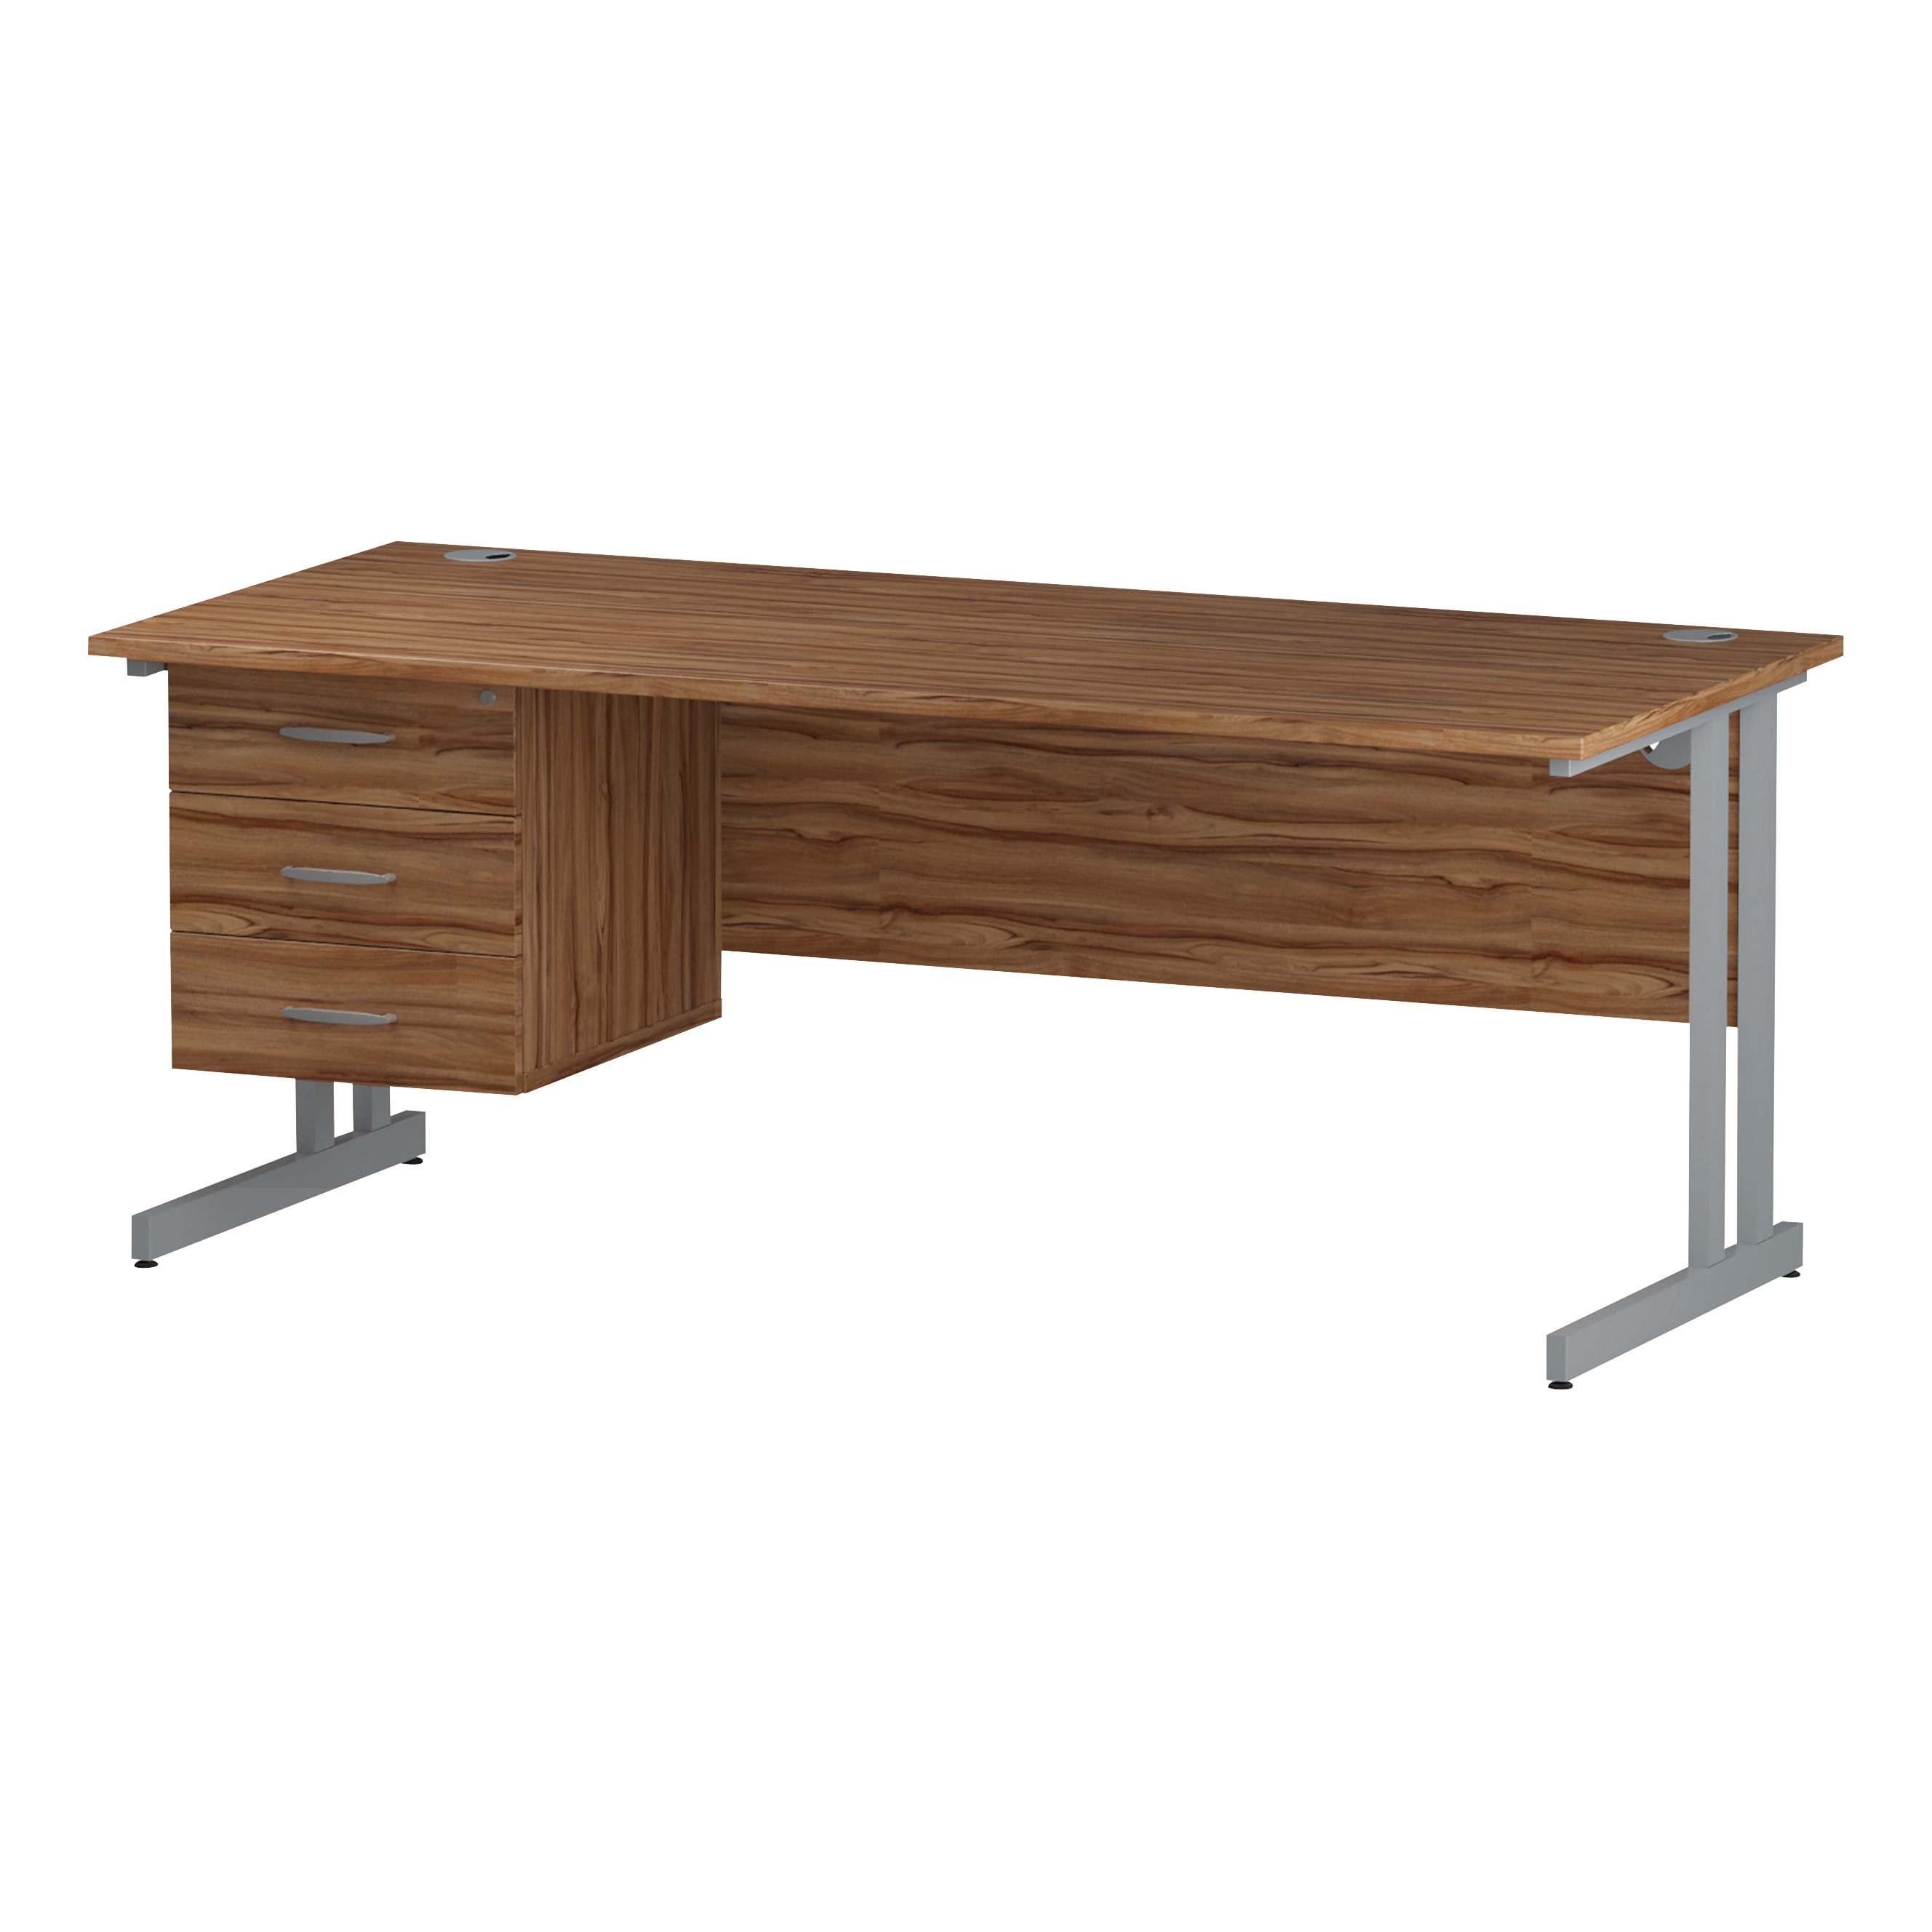 Trexus Rectangular Desk Silver Cantilever Leg 1800x800mm Fixed Pedestal 3 Drawers Walnut Ref I001930